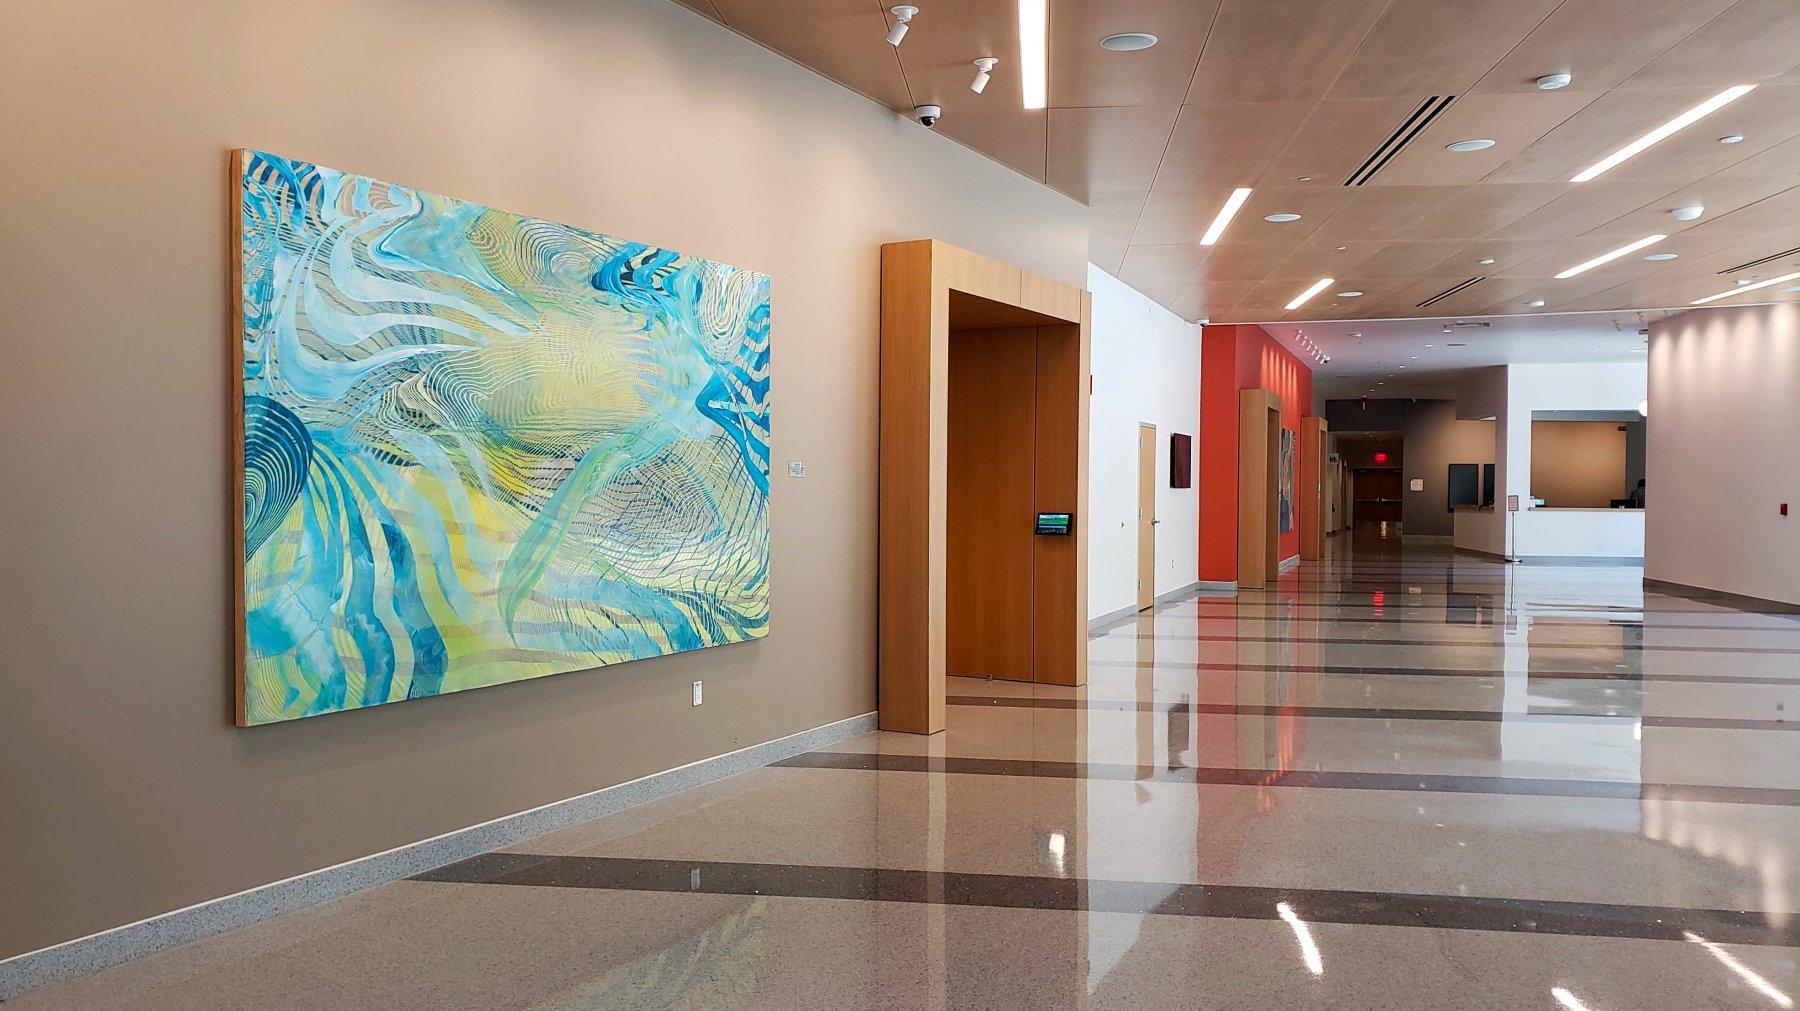 Wavelets, lobby view